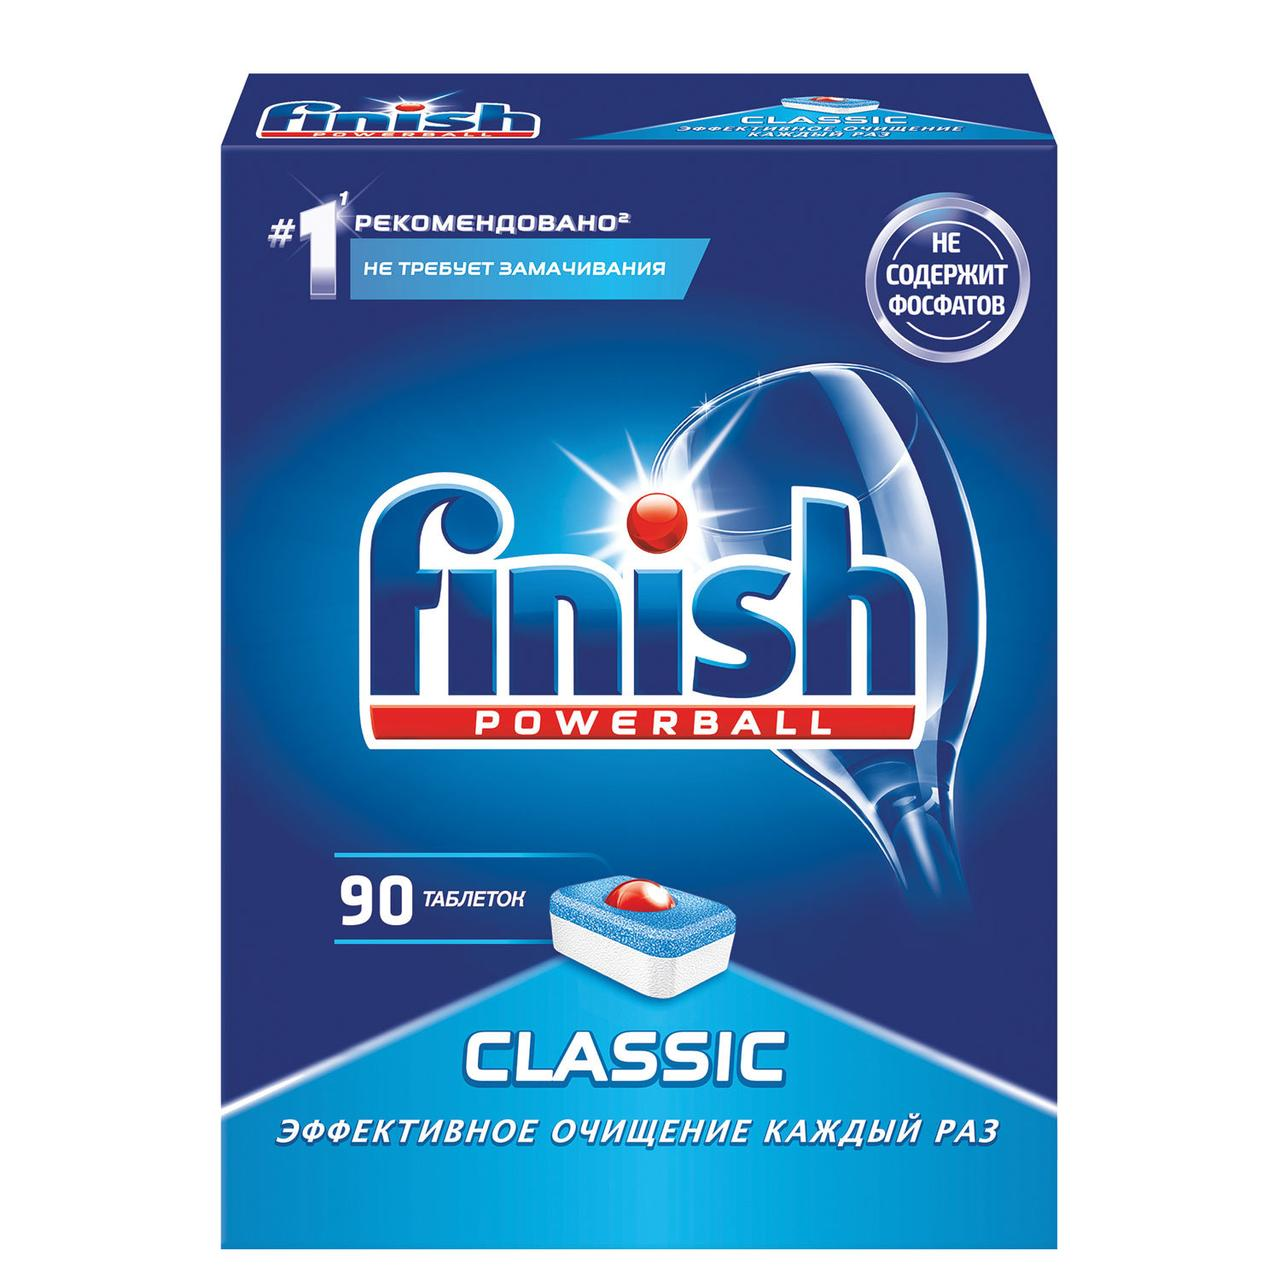 Таблетки для посудомоечных машин Powerball Classic Finish (90 шт/уп)